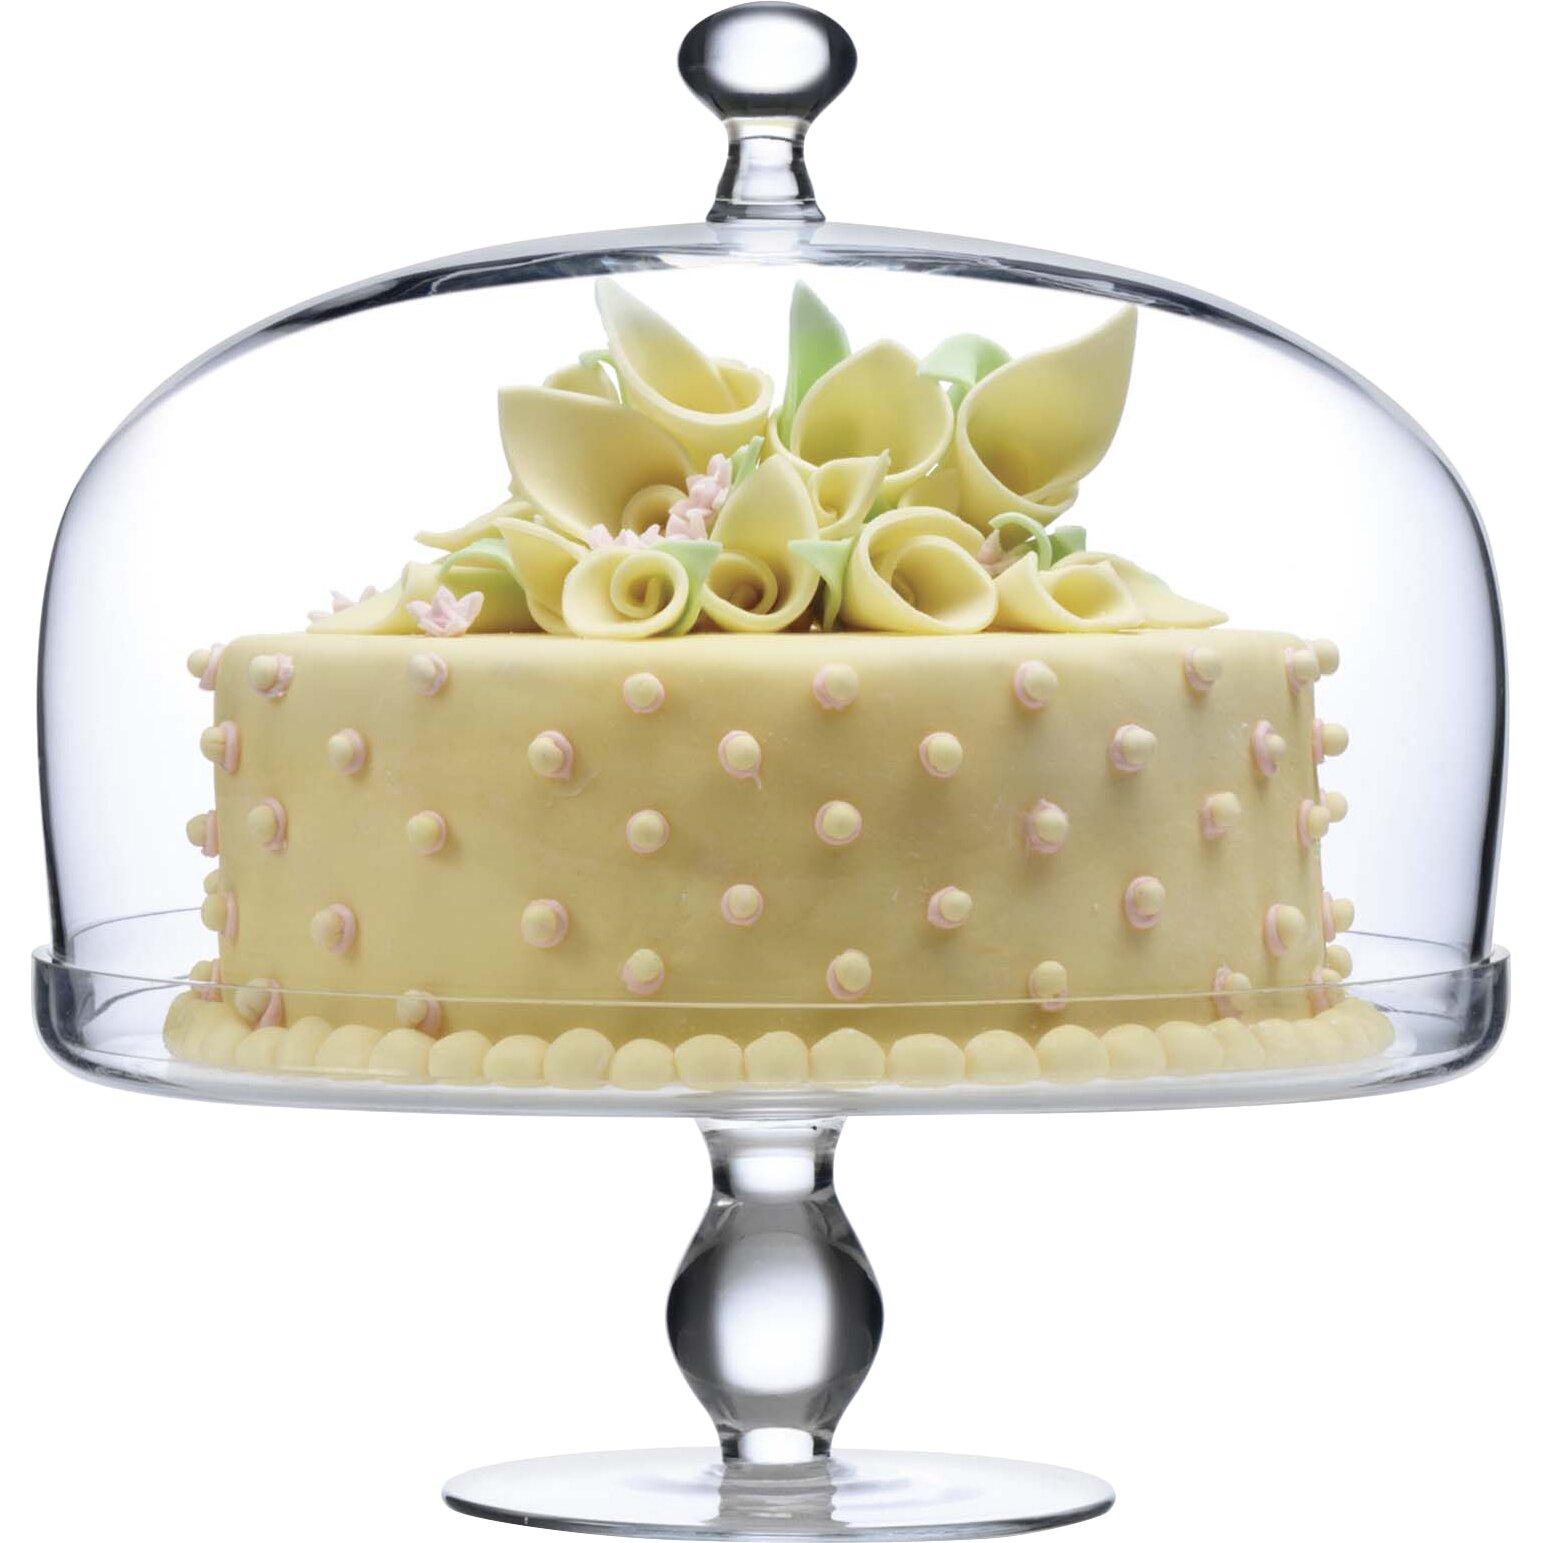 Luigi Bormioli  In  Cake Stand